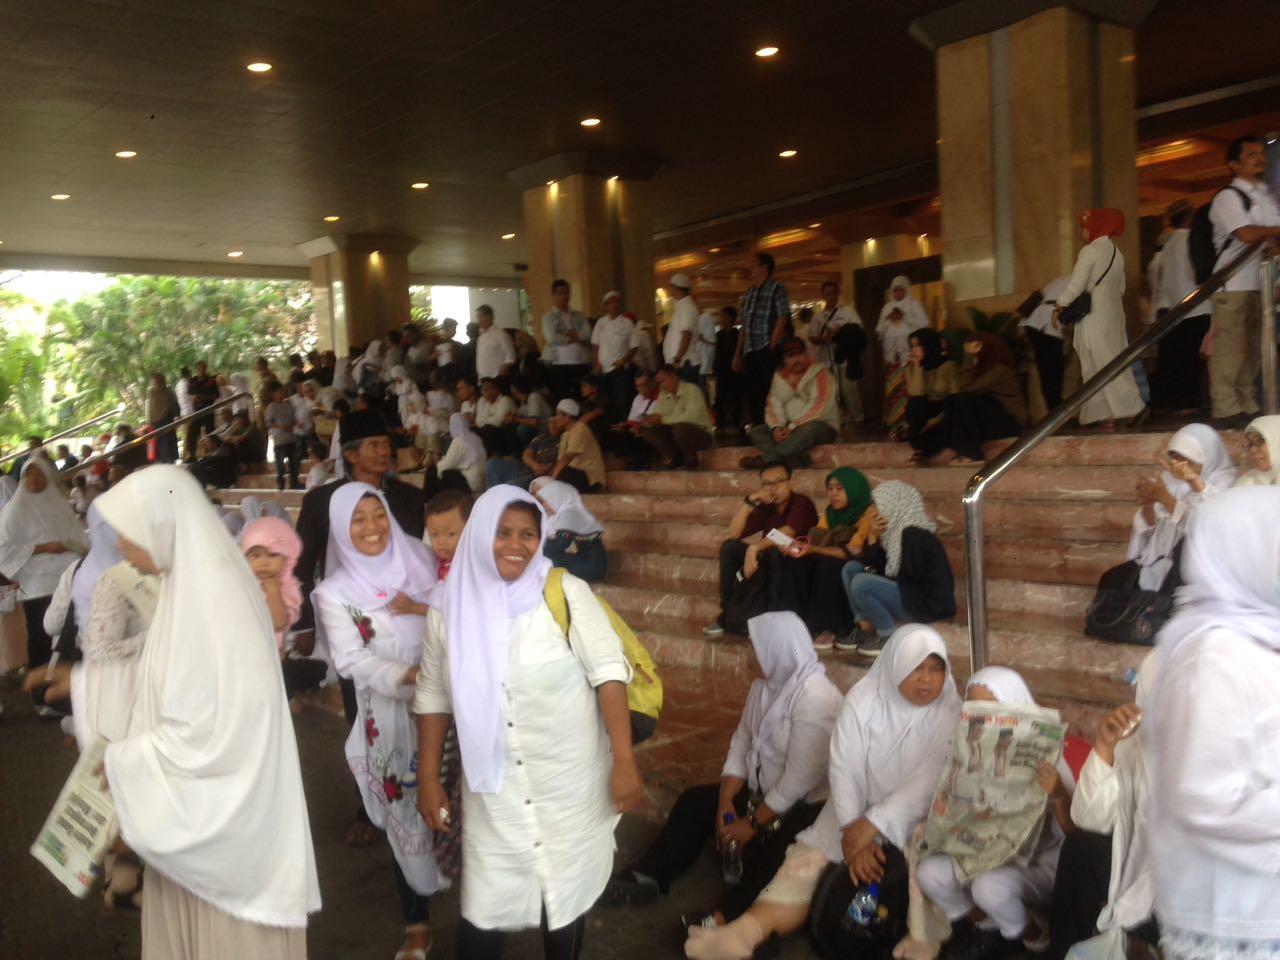 Suasana di Balai Kota Sore Ini: Kok Banyak yang nggak ngerokok ya?